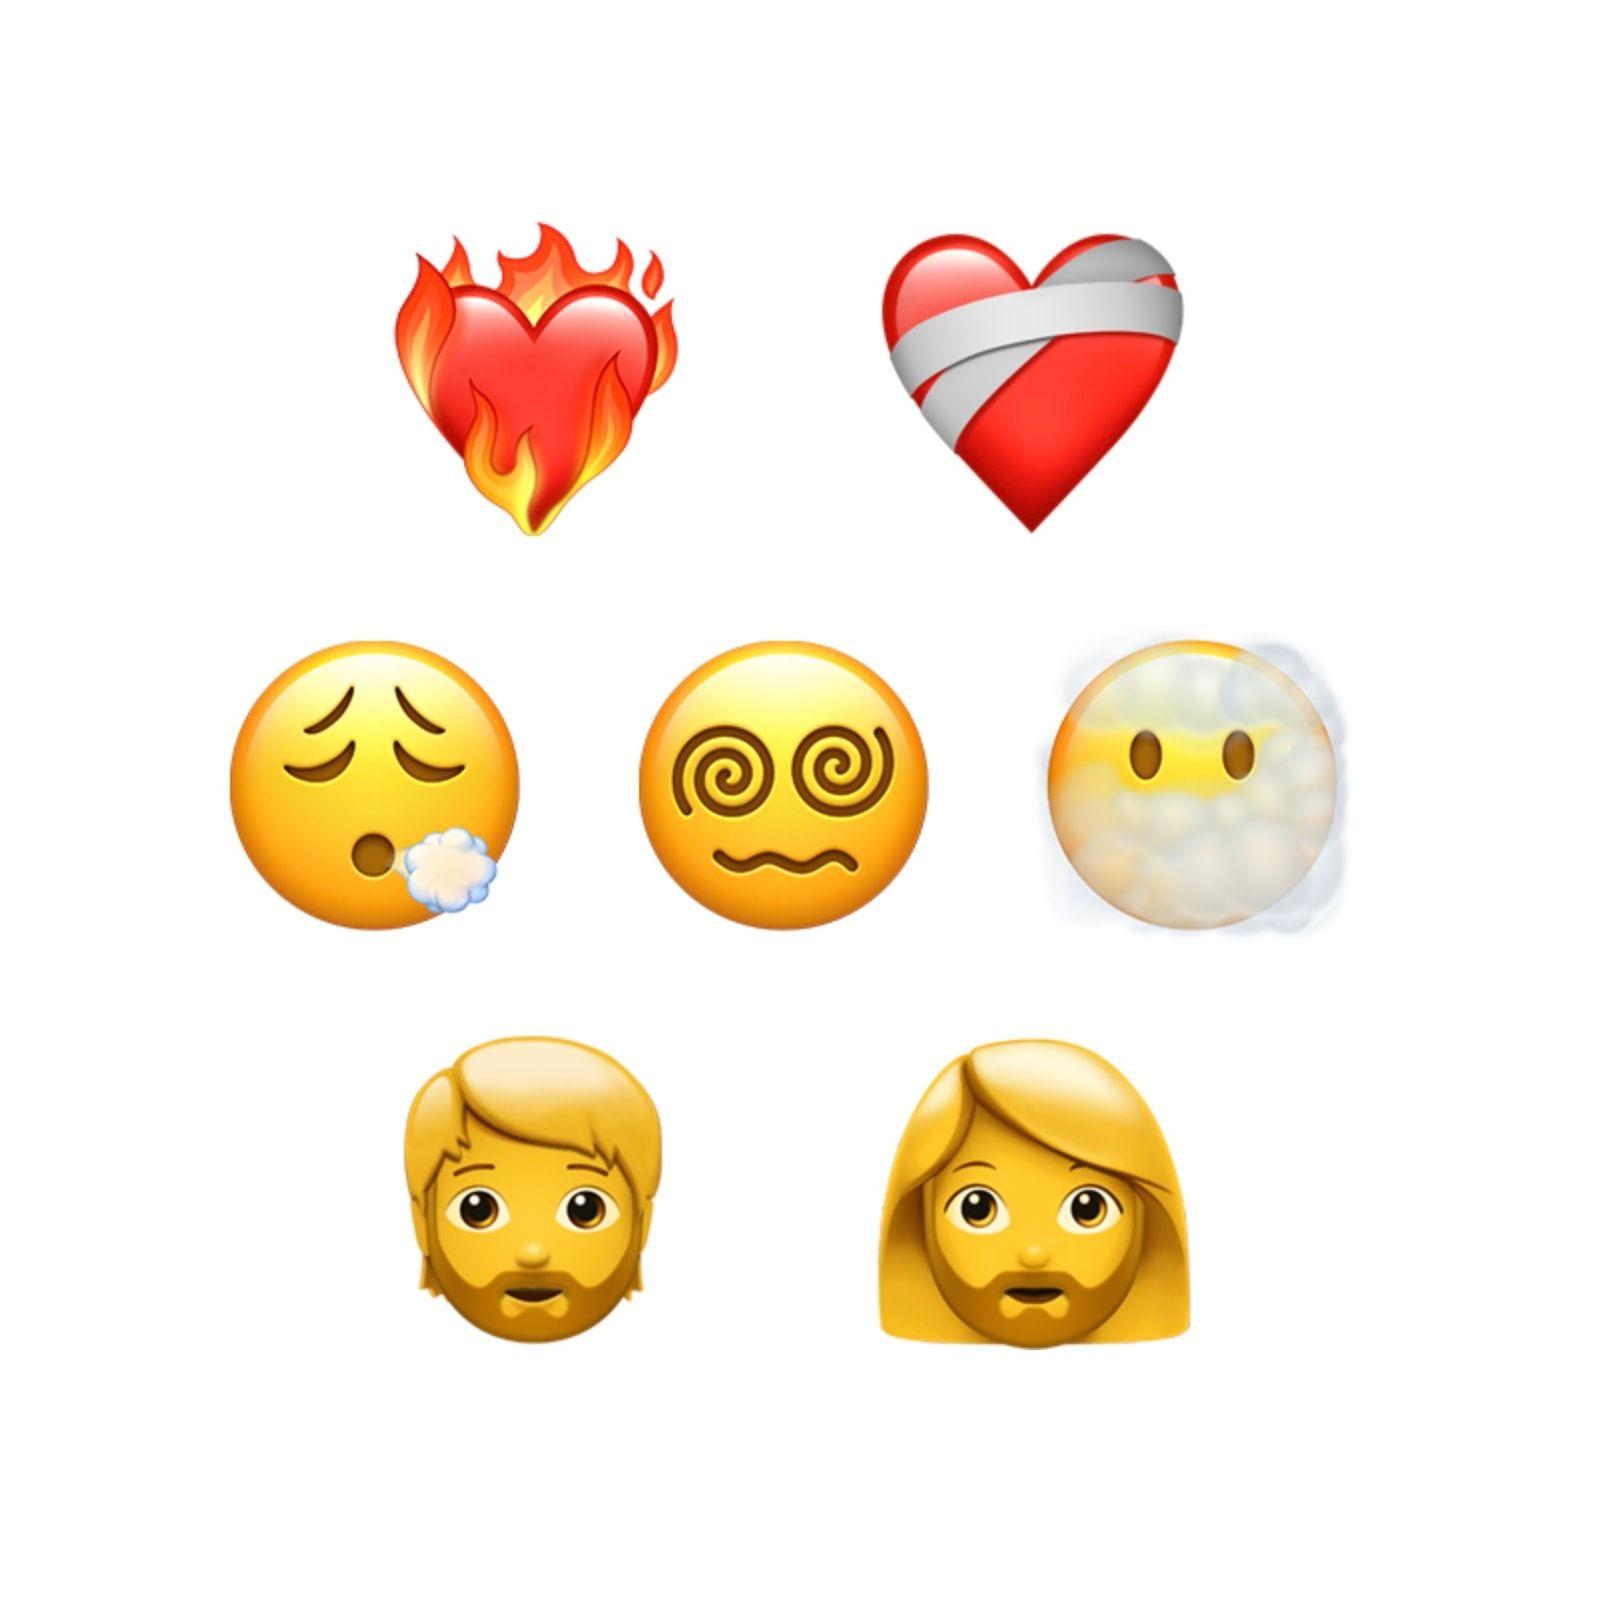 new-emojis-in-ios-14-5-emojipedia-1